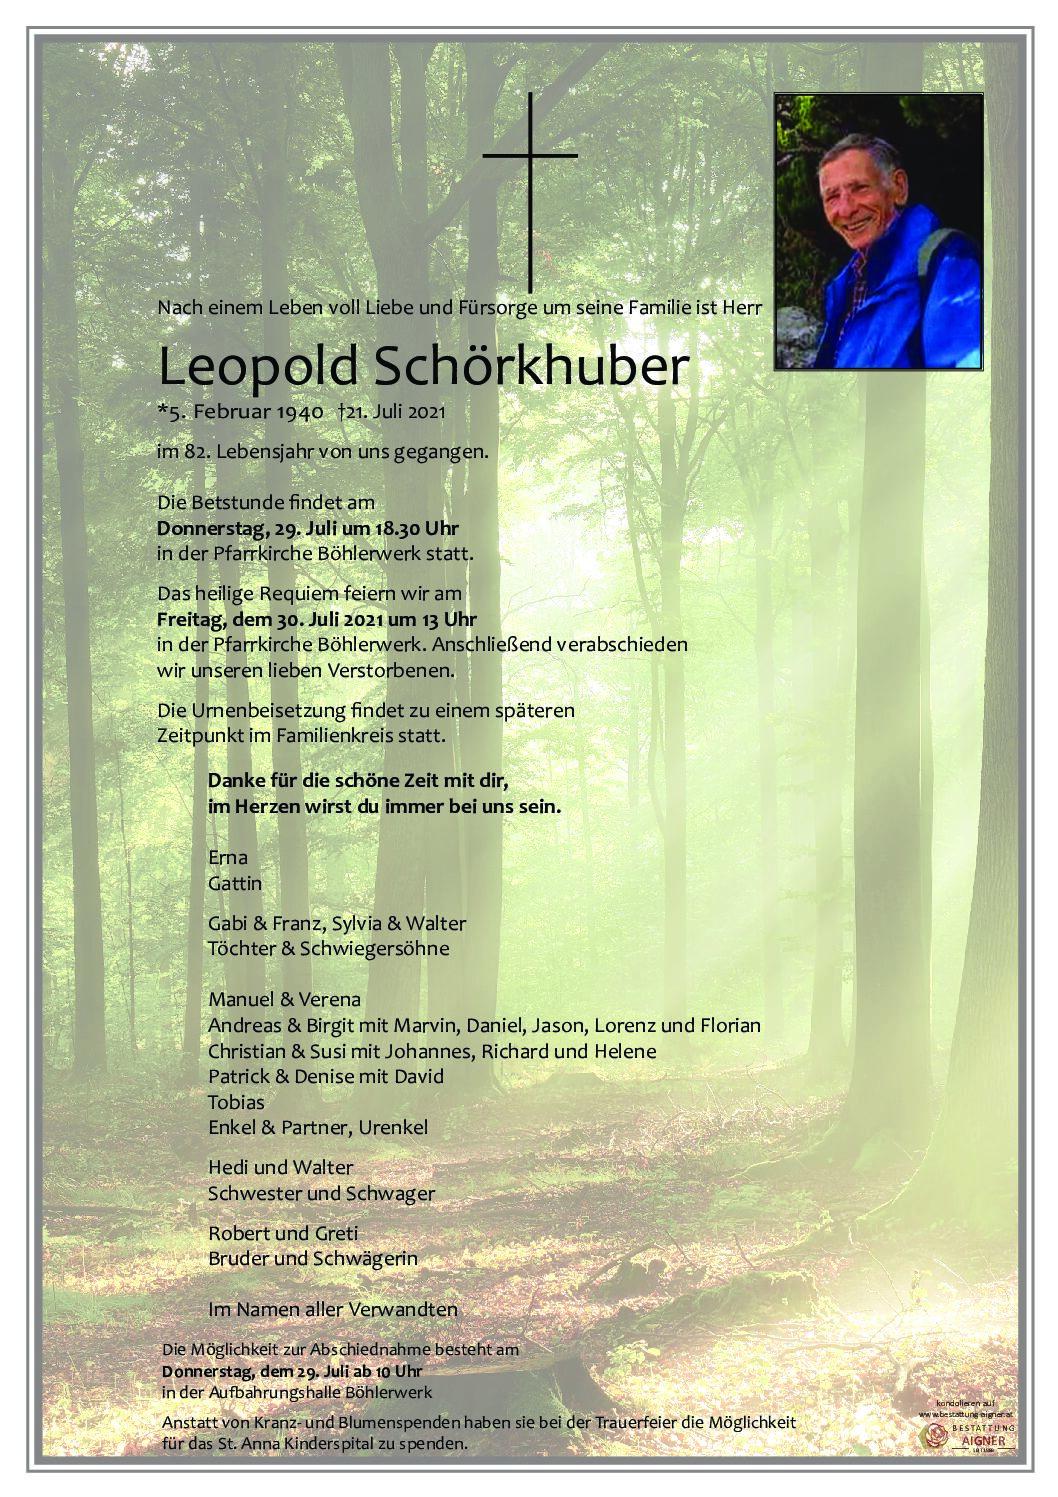 Leopold Schörkhuber